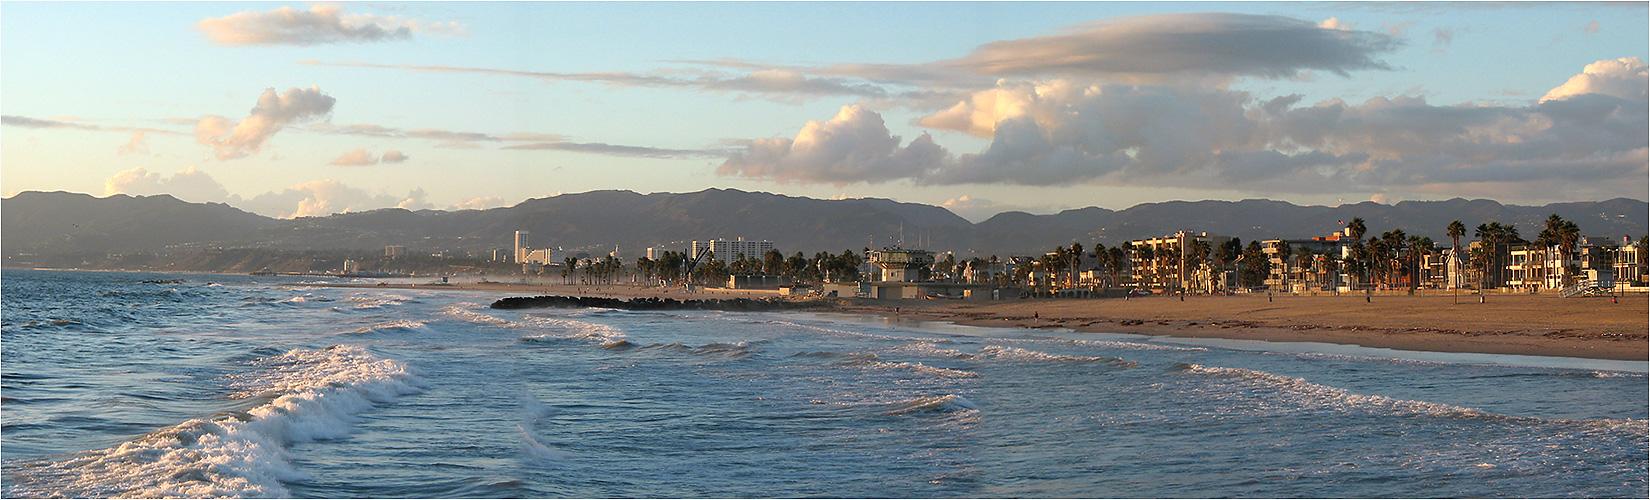 West Coast - L.A.